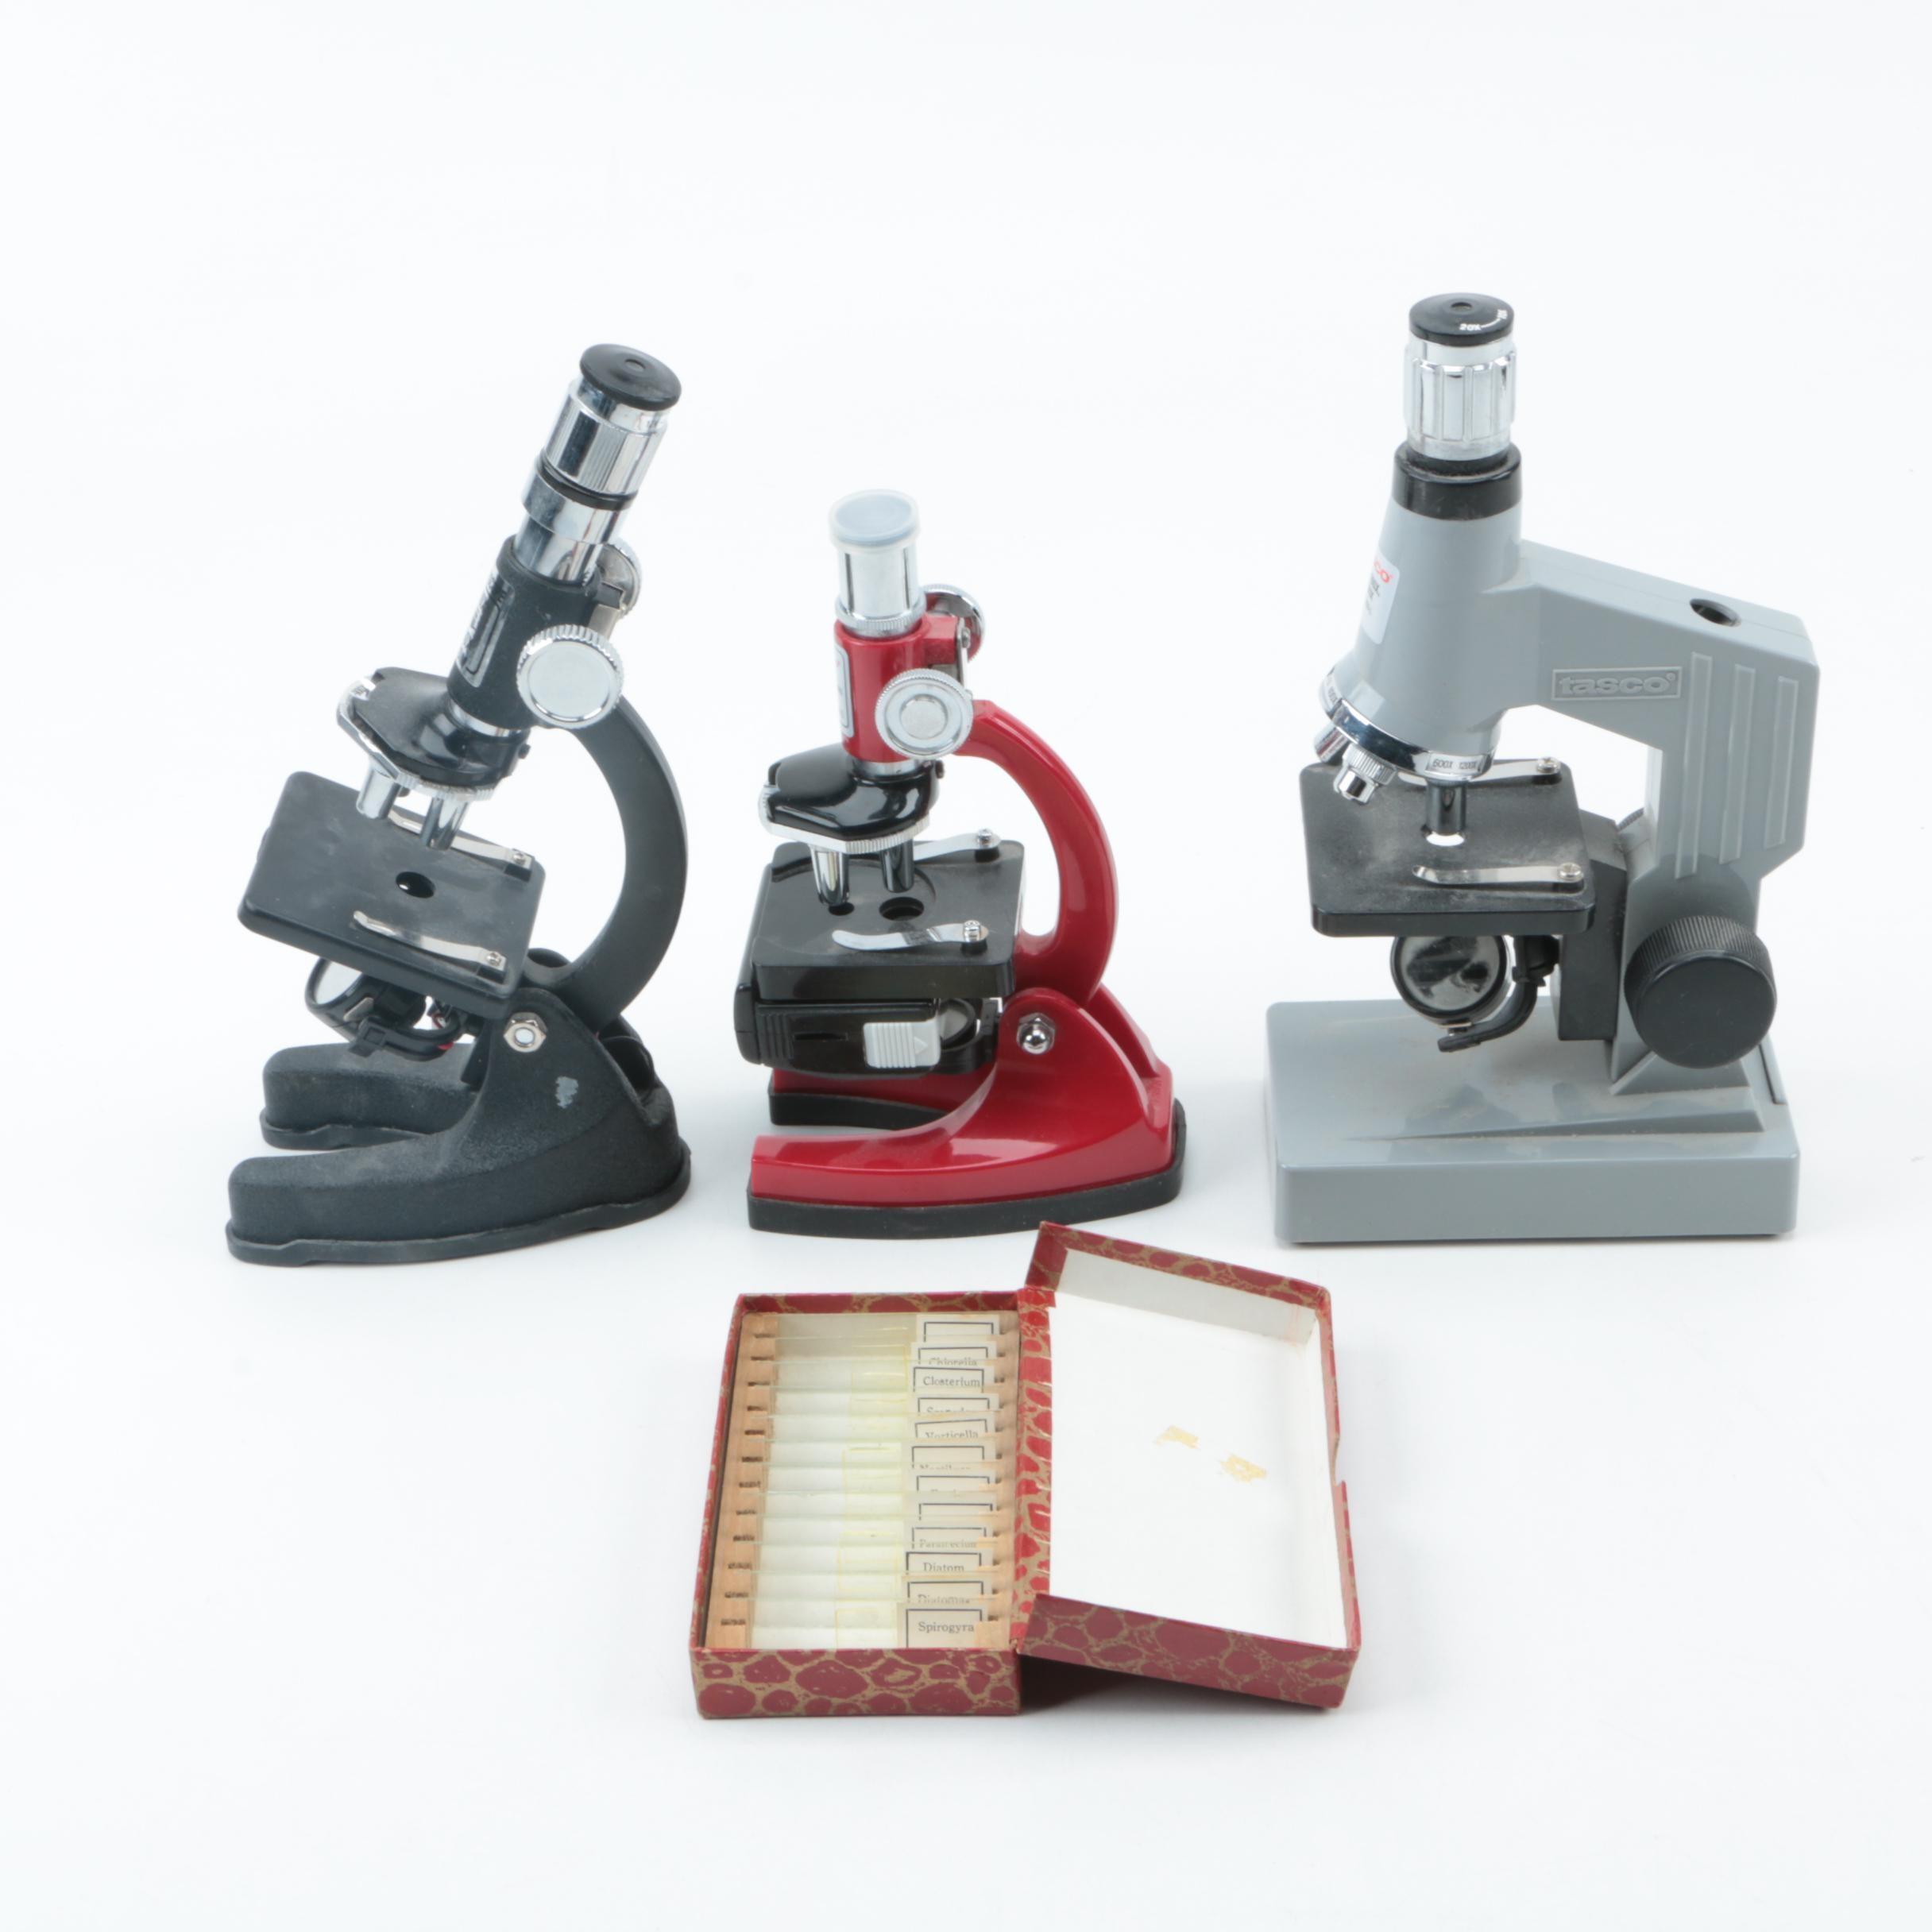 Tasco Microscopes with Box of Prepared Slides